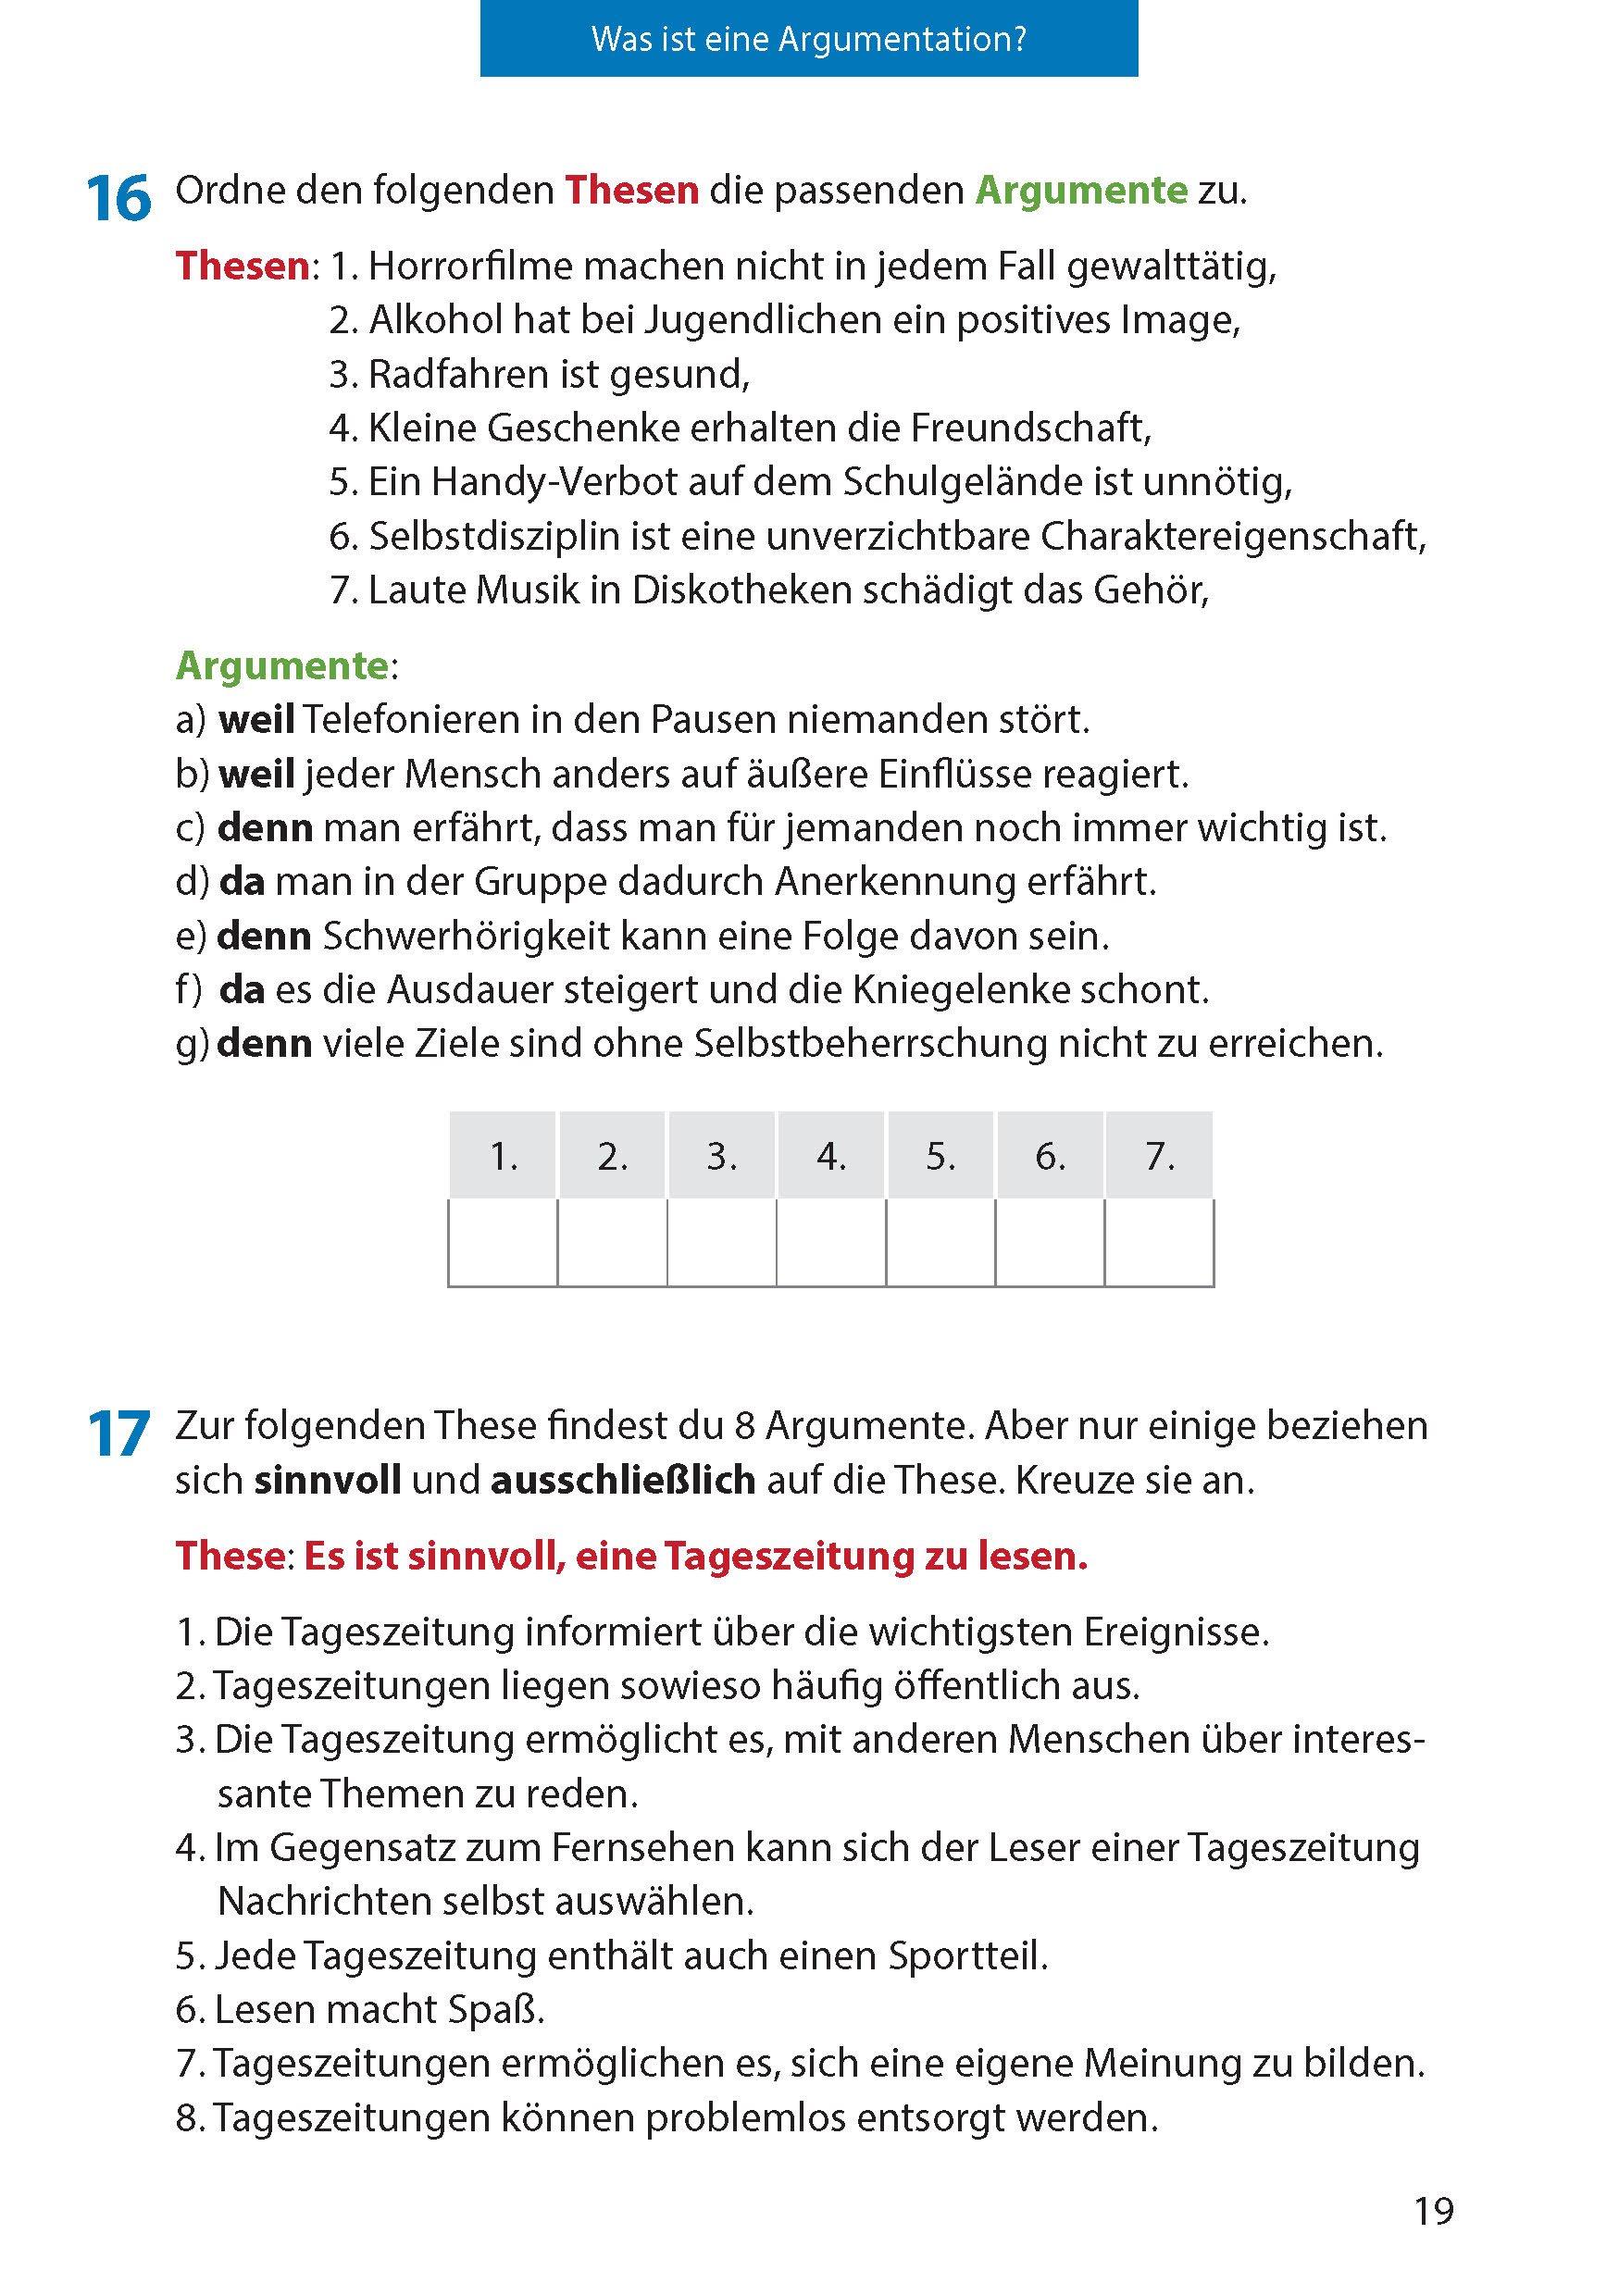 Charmant 8 Teile Der Rede Arbeitsblatt Galerie - Mathe Arbeitsblatt ...